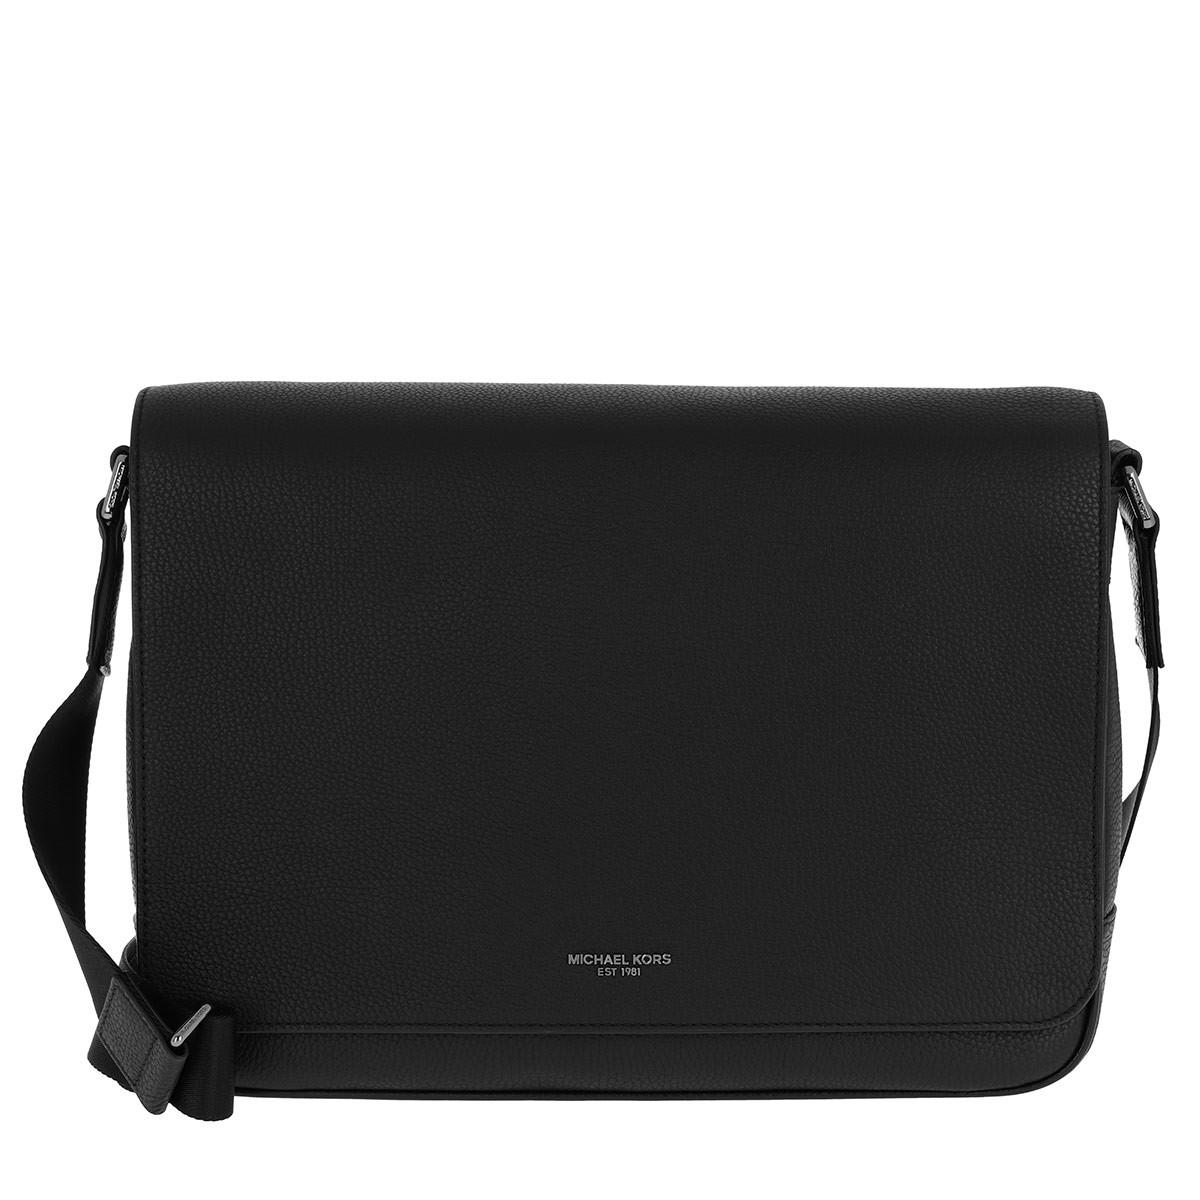 16ukG14DHk Andere tassen - Bryant LG EW Messenger Black in zwart voor dames